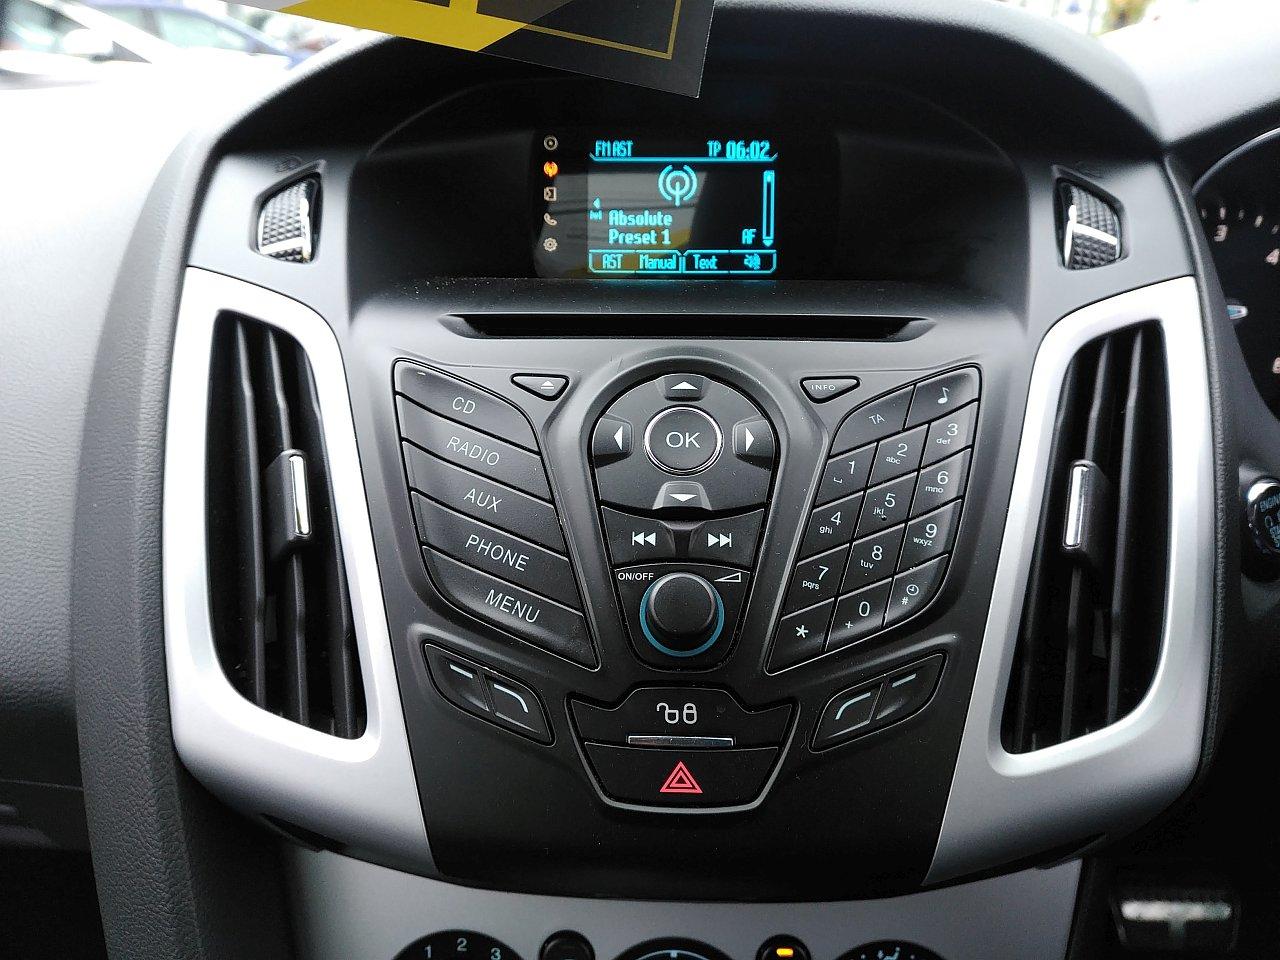 Ford Focus 2.0 TDCi 163 Zetec S 5dr Powershift image 15